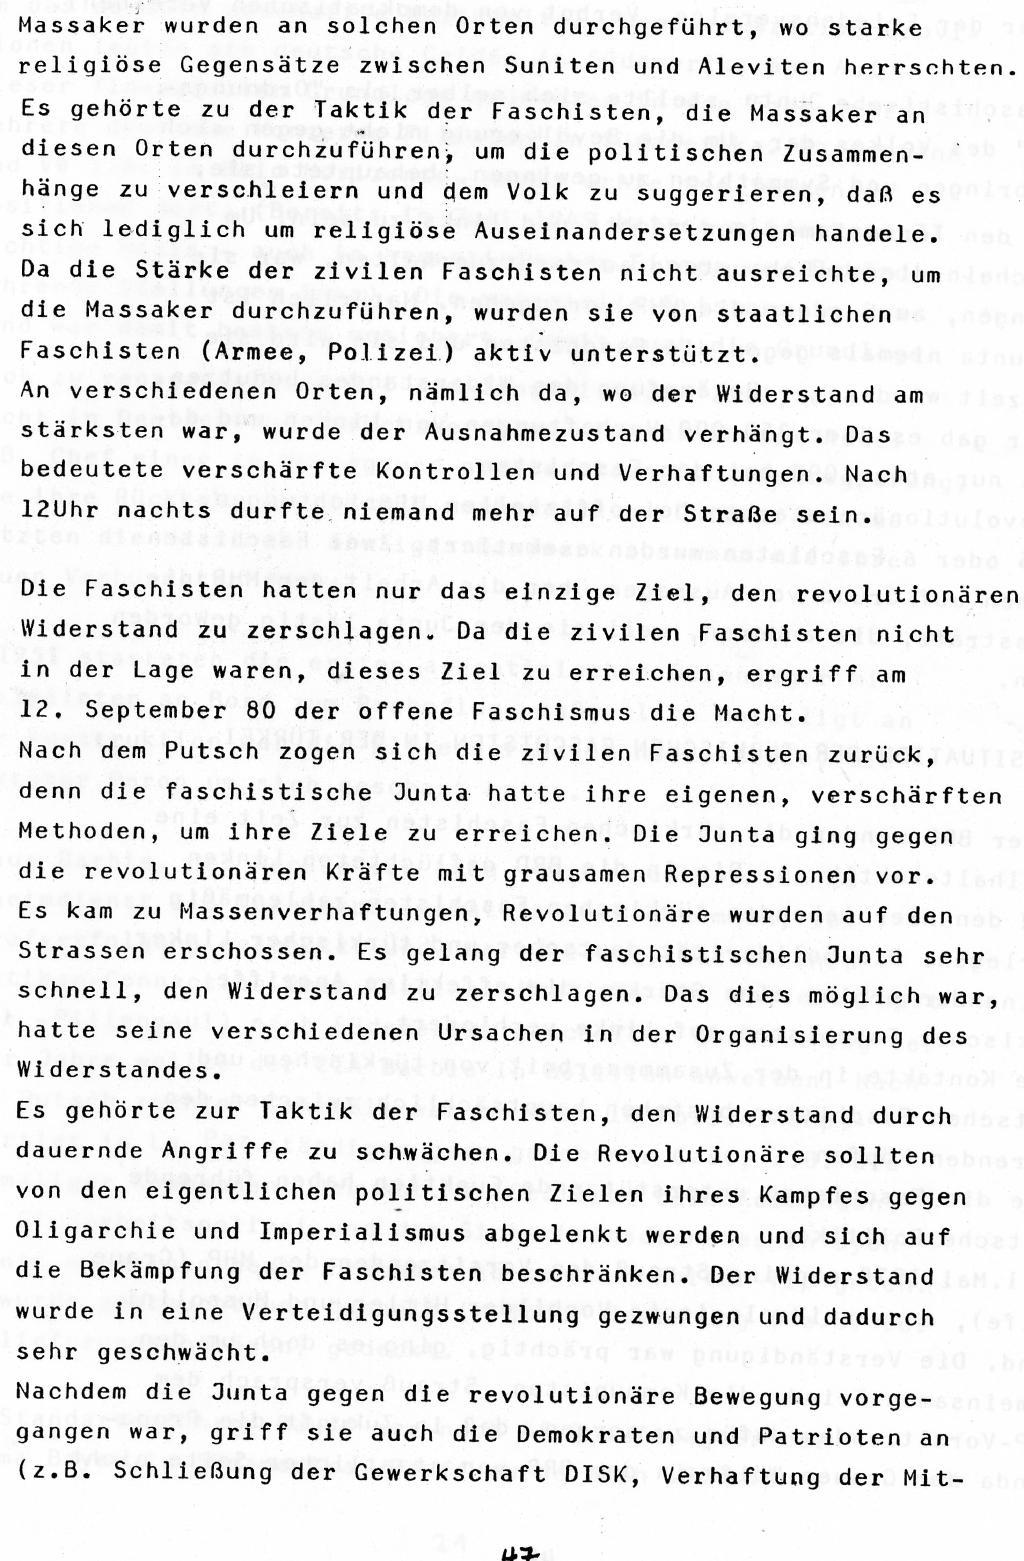 Berlin_1983_Autonome_Gruppen_Faschismus_im_Kapitalismus_47